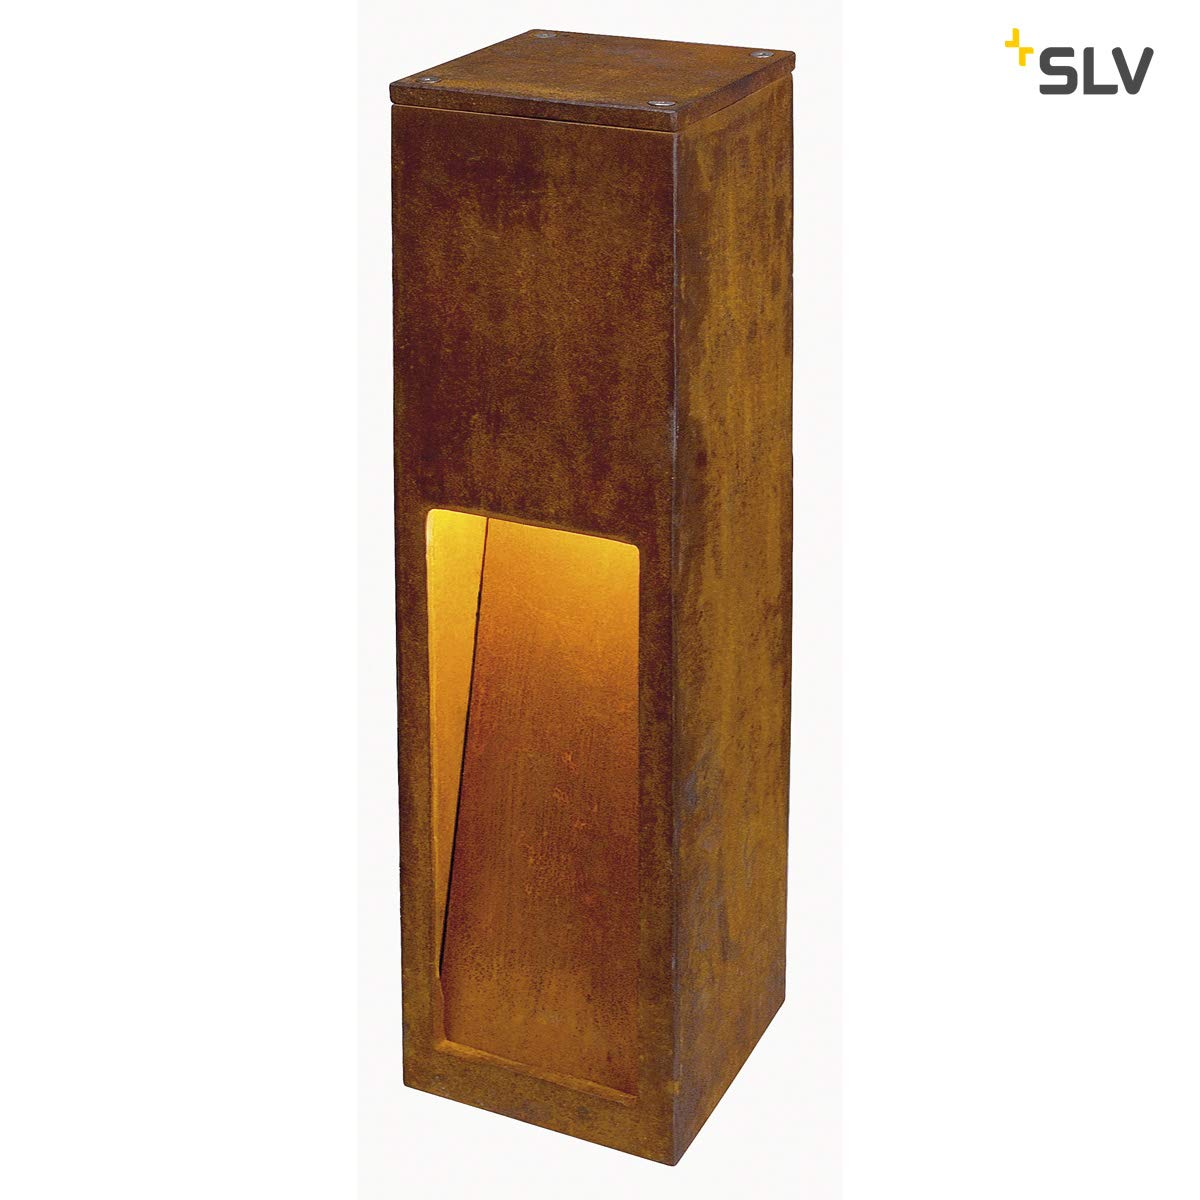 Luminaria pie Exterior 11w oxido Hierro SLV Rusty Slot 50